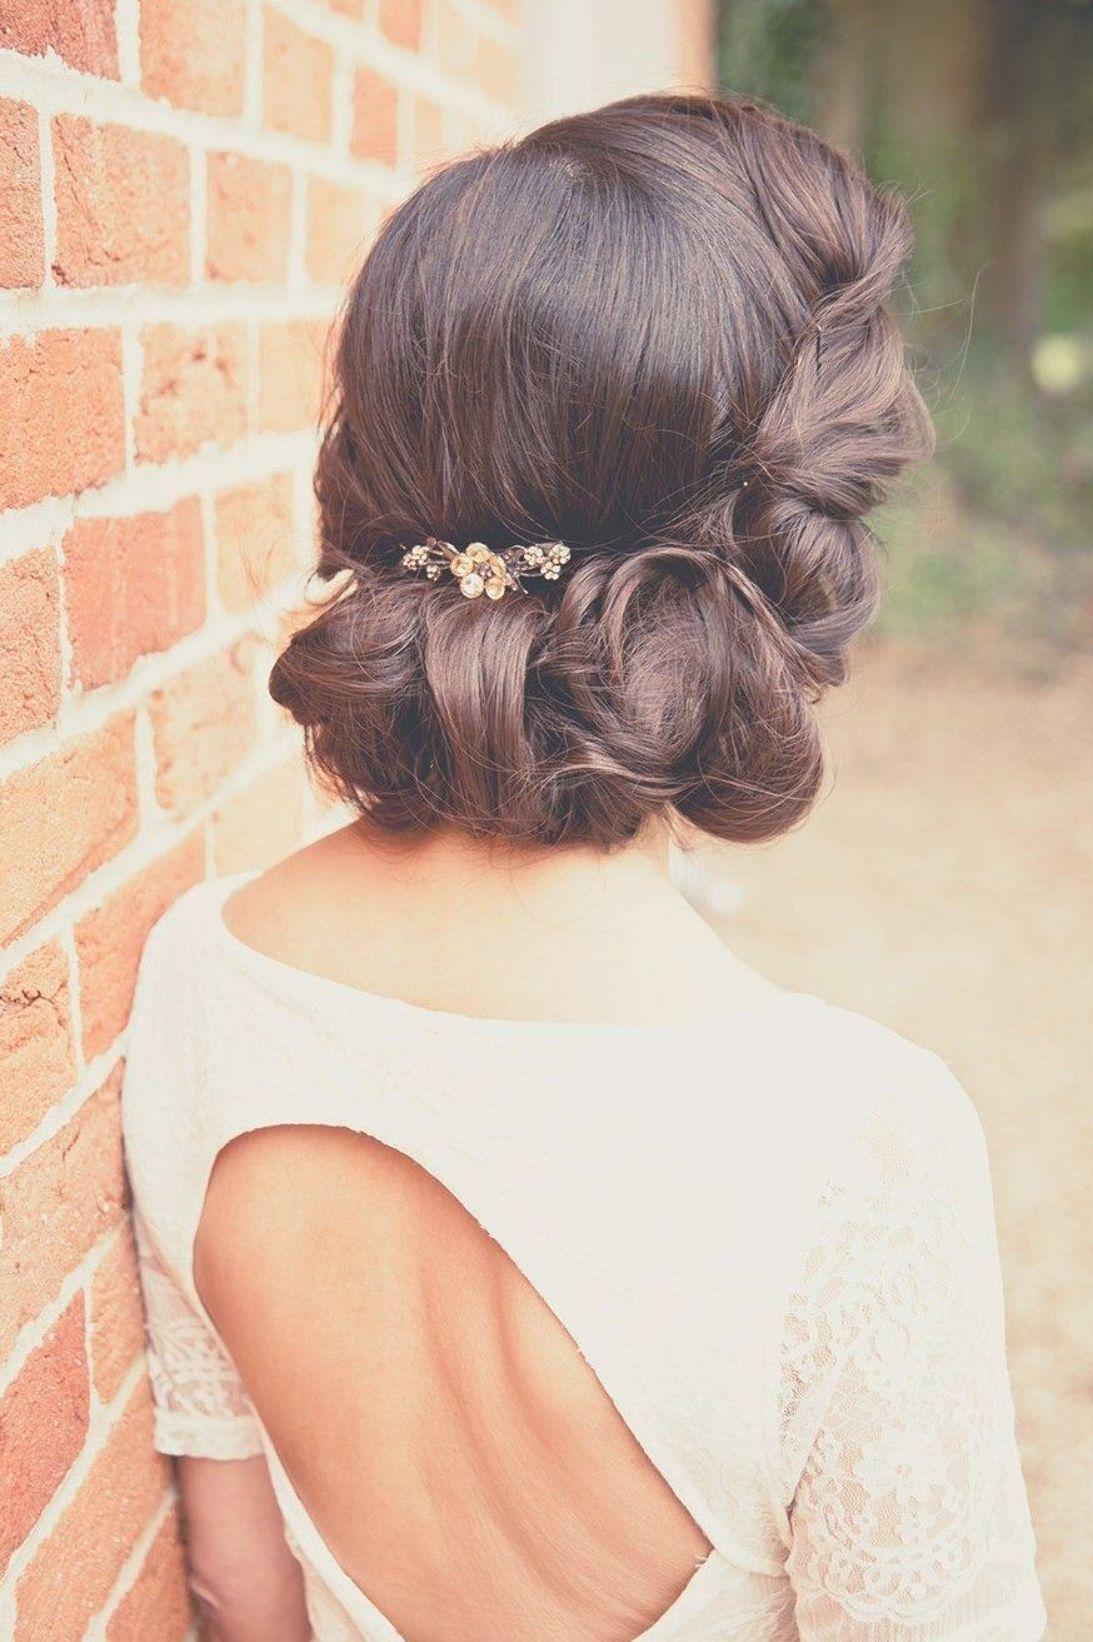 Retro Wedding Hairstyle 8 Retro Wedding Hair Vintage Wedding Hair Retro Hairstyles